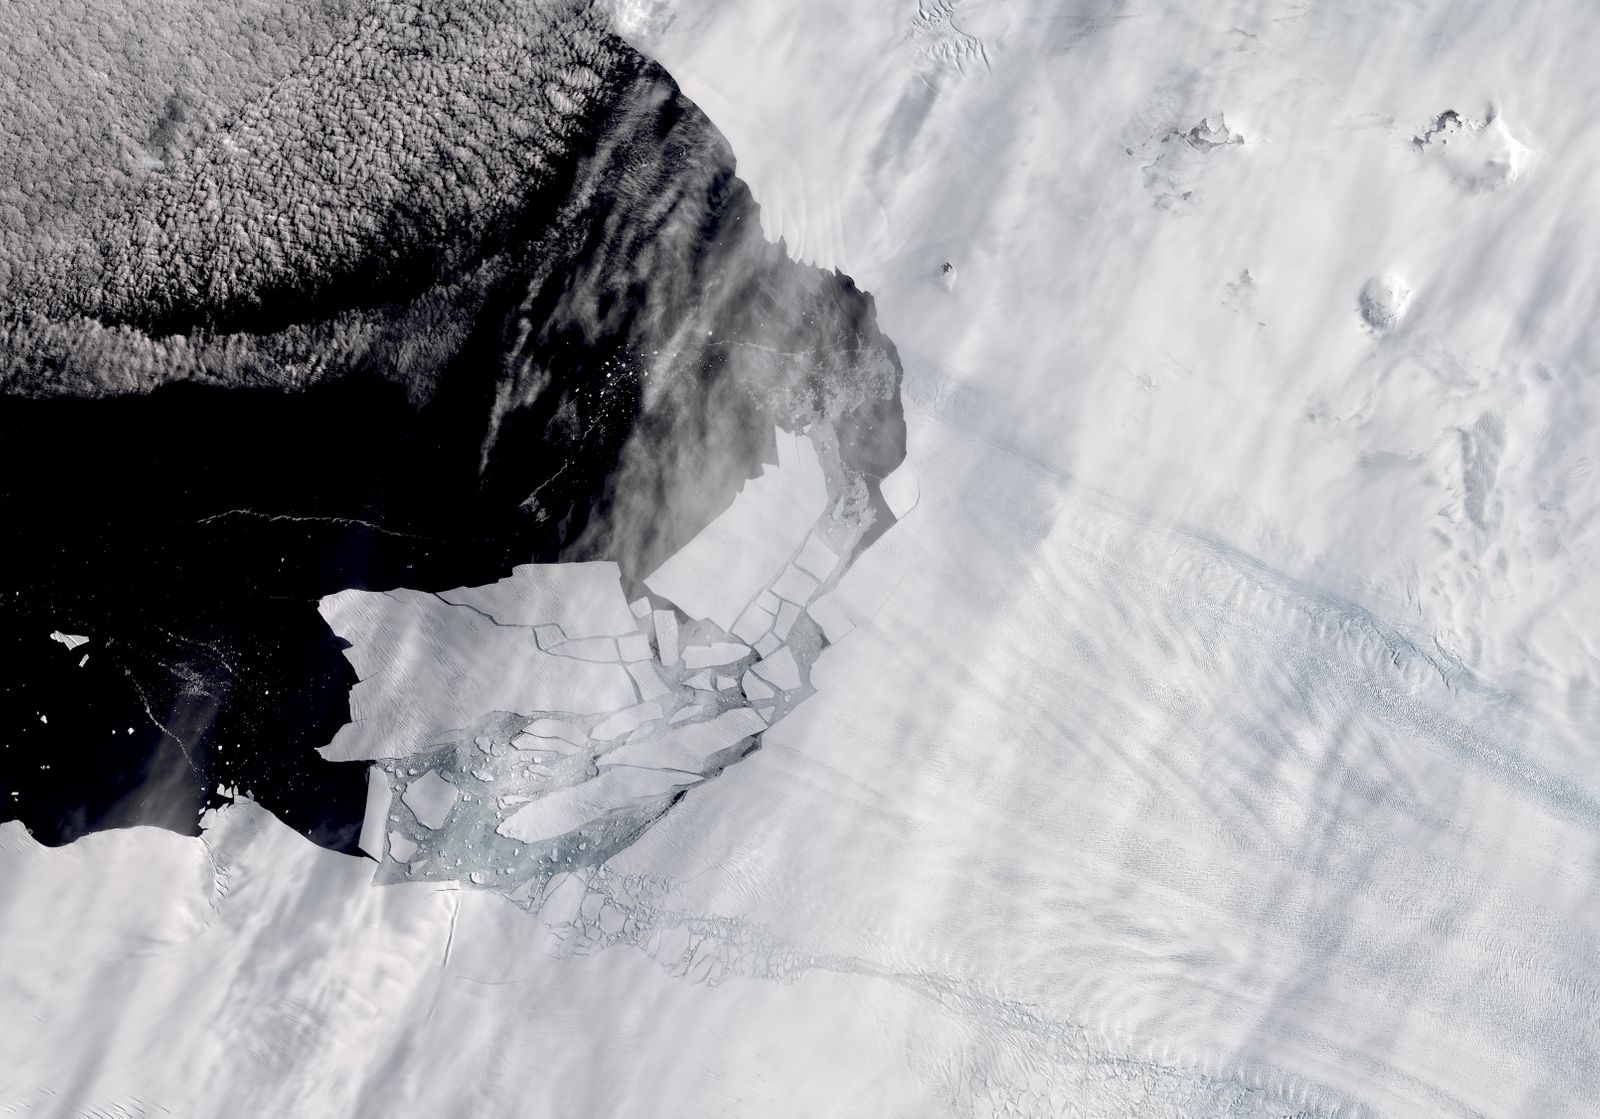 Icebergs detach from the Pine Island Glacier in Antarctica